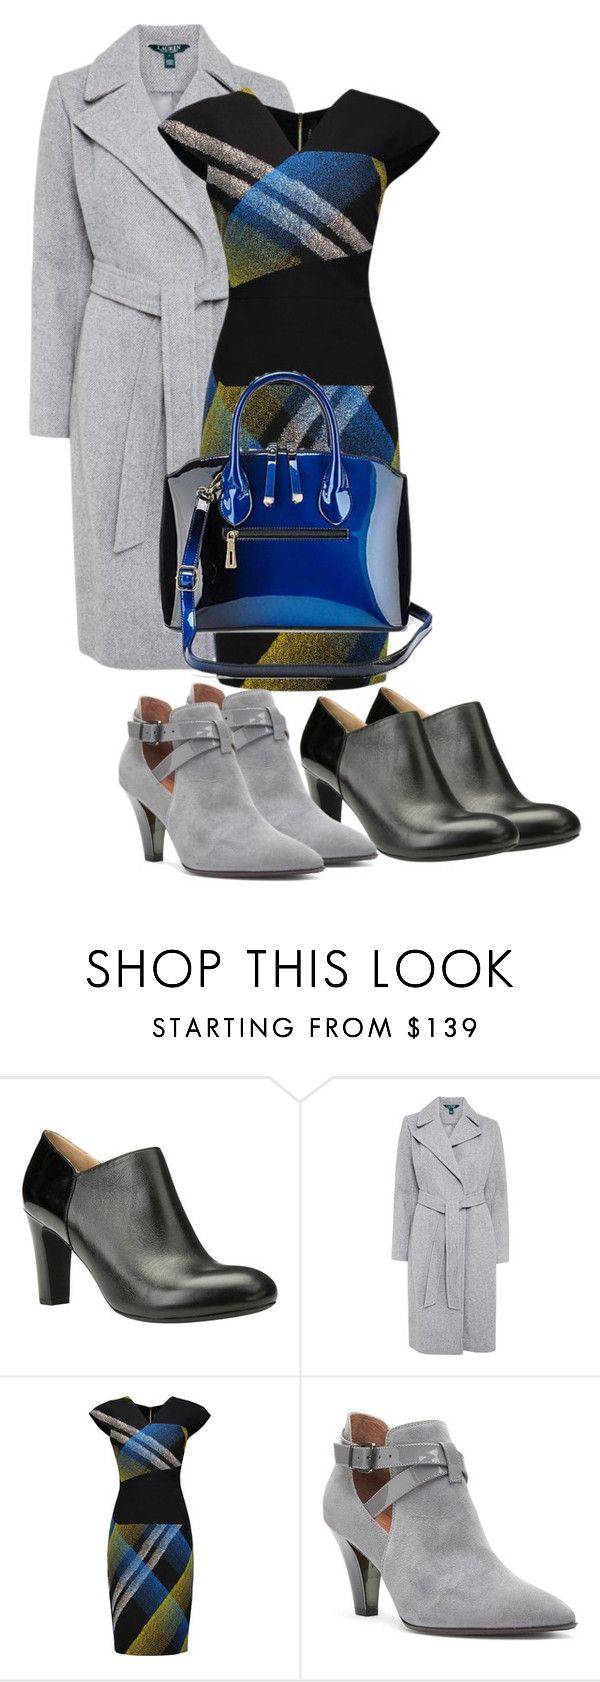 """Which booties?"" by havlova-blanka on Polyvore featuring Geox, Lauren Ralph Lauren, Roland Mouret and Donald J Pliner"